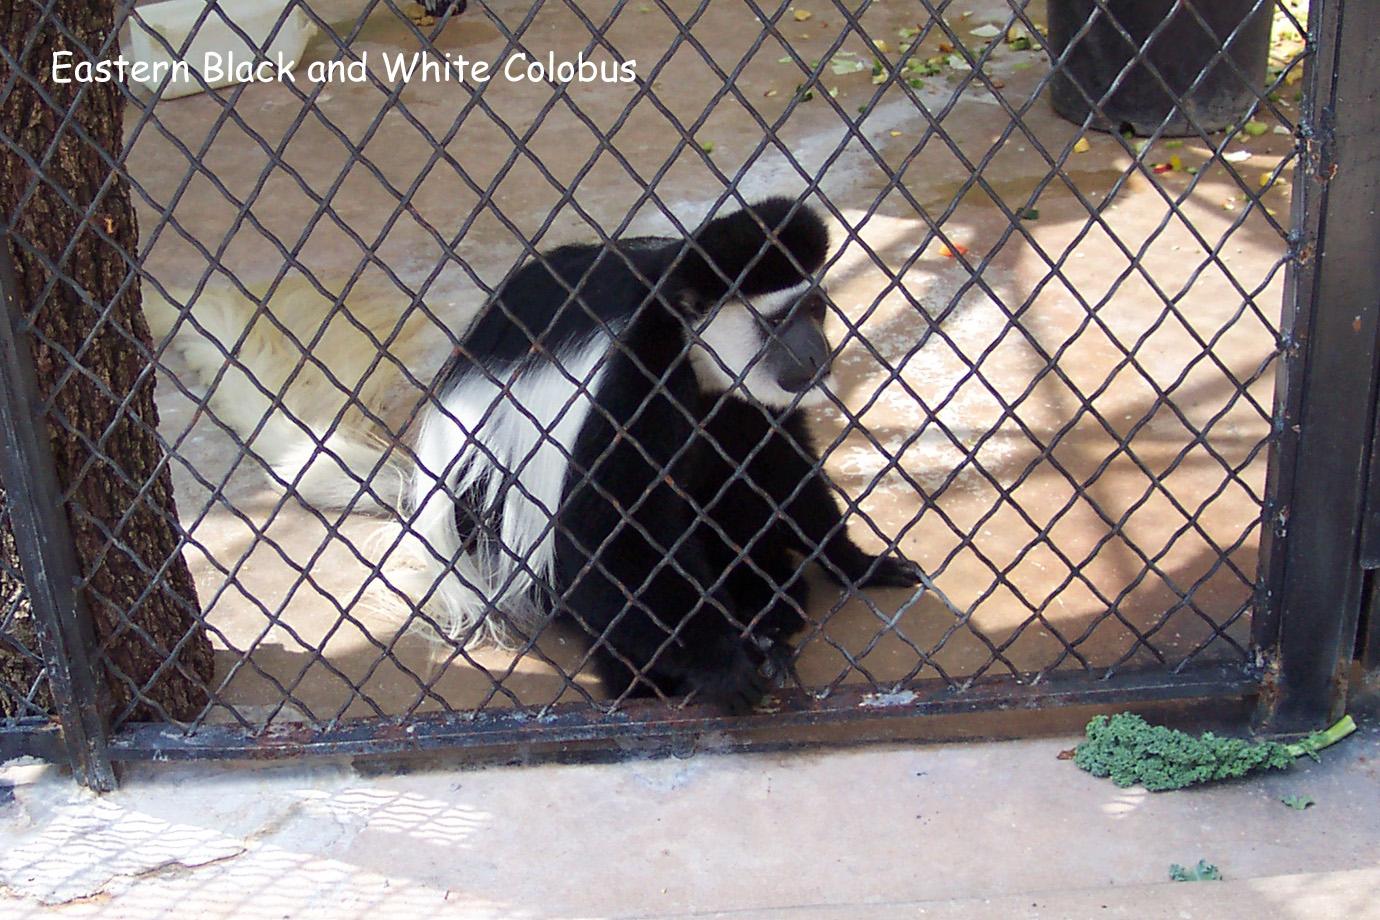 Lagniappe - San Antonio Zoo Photographs